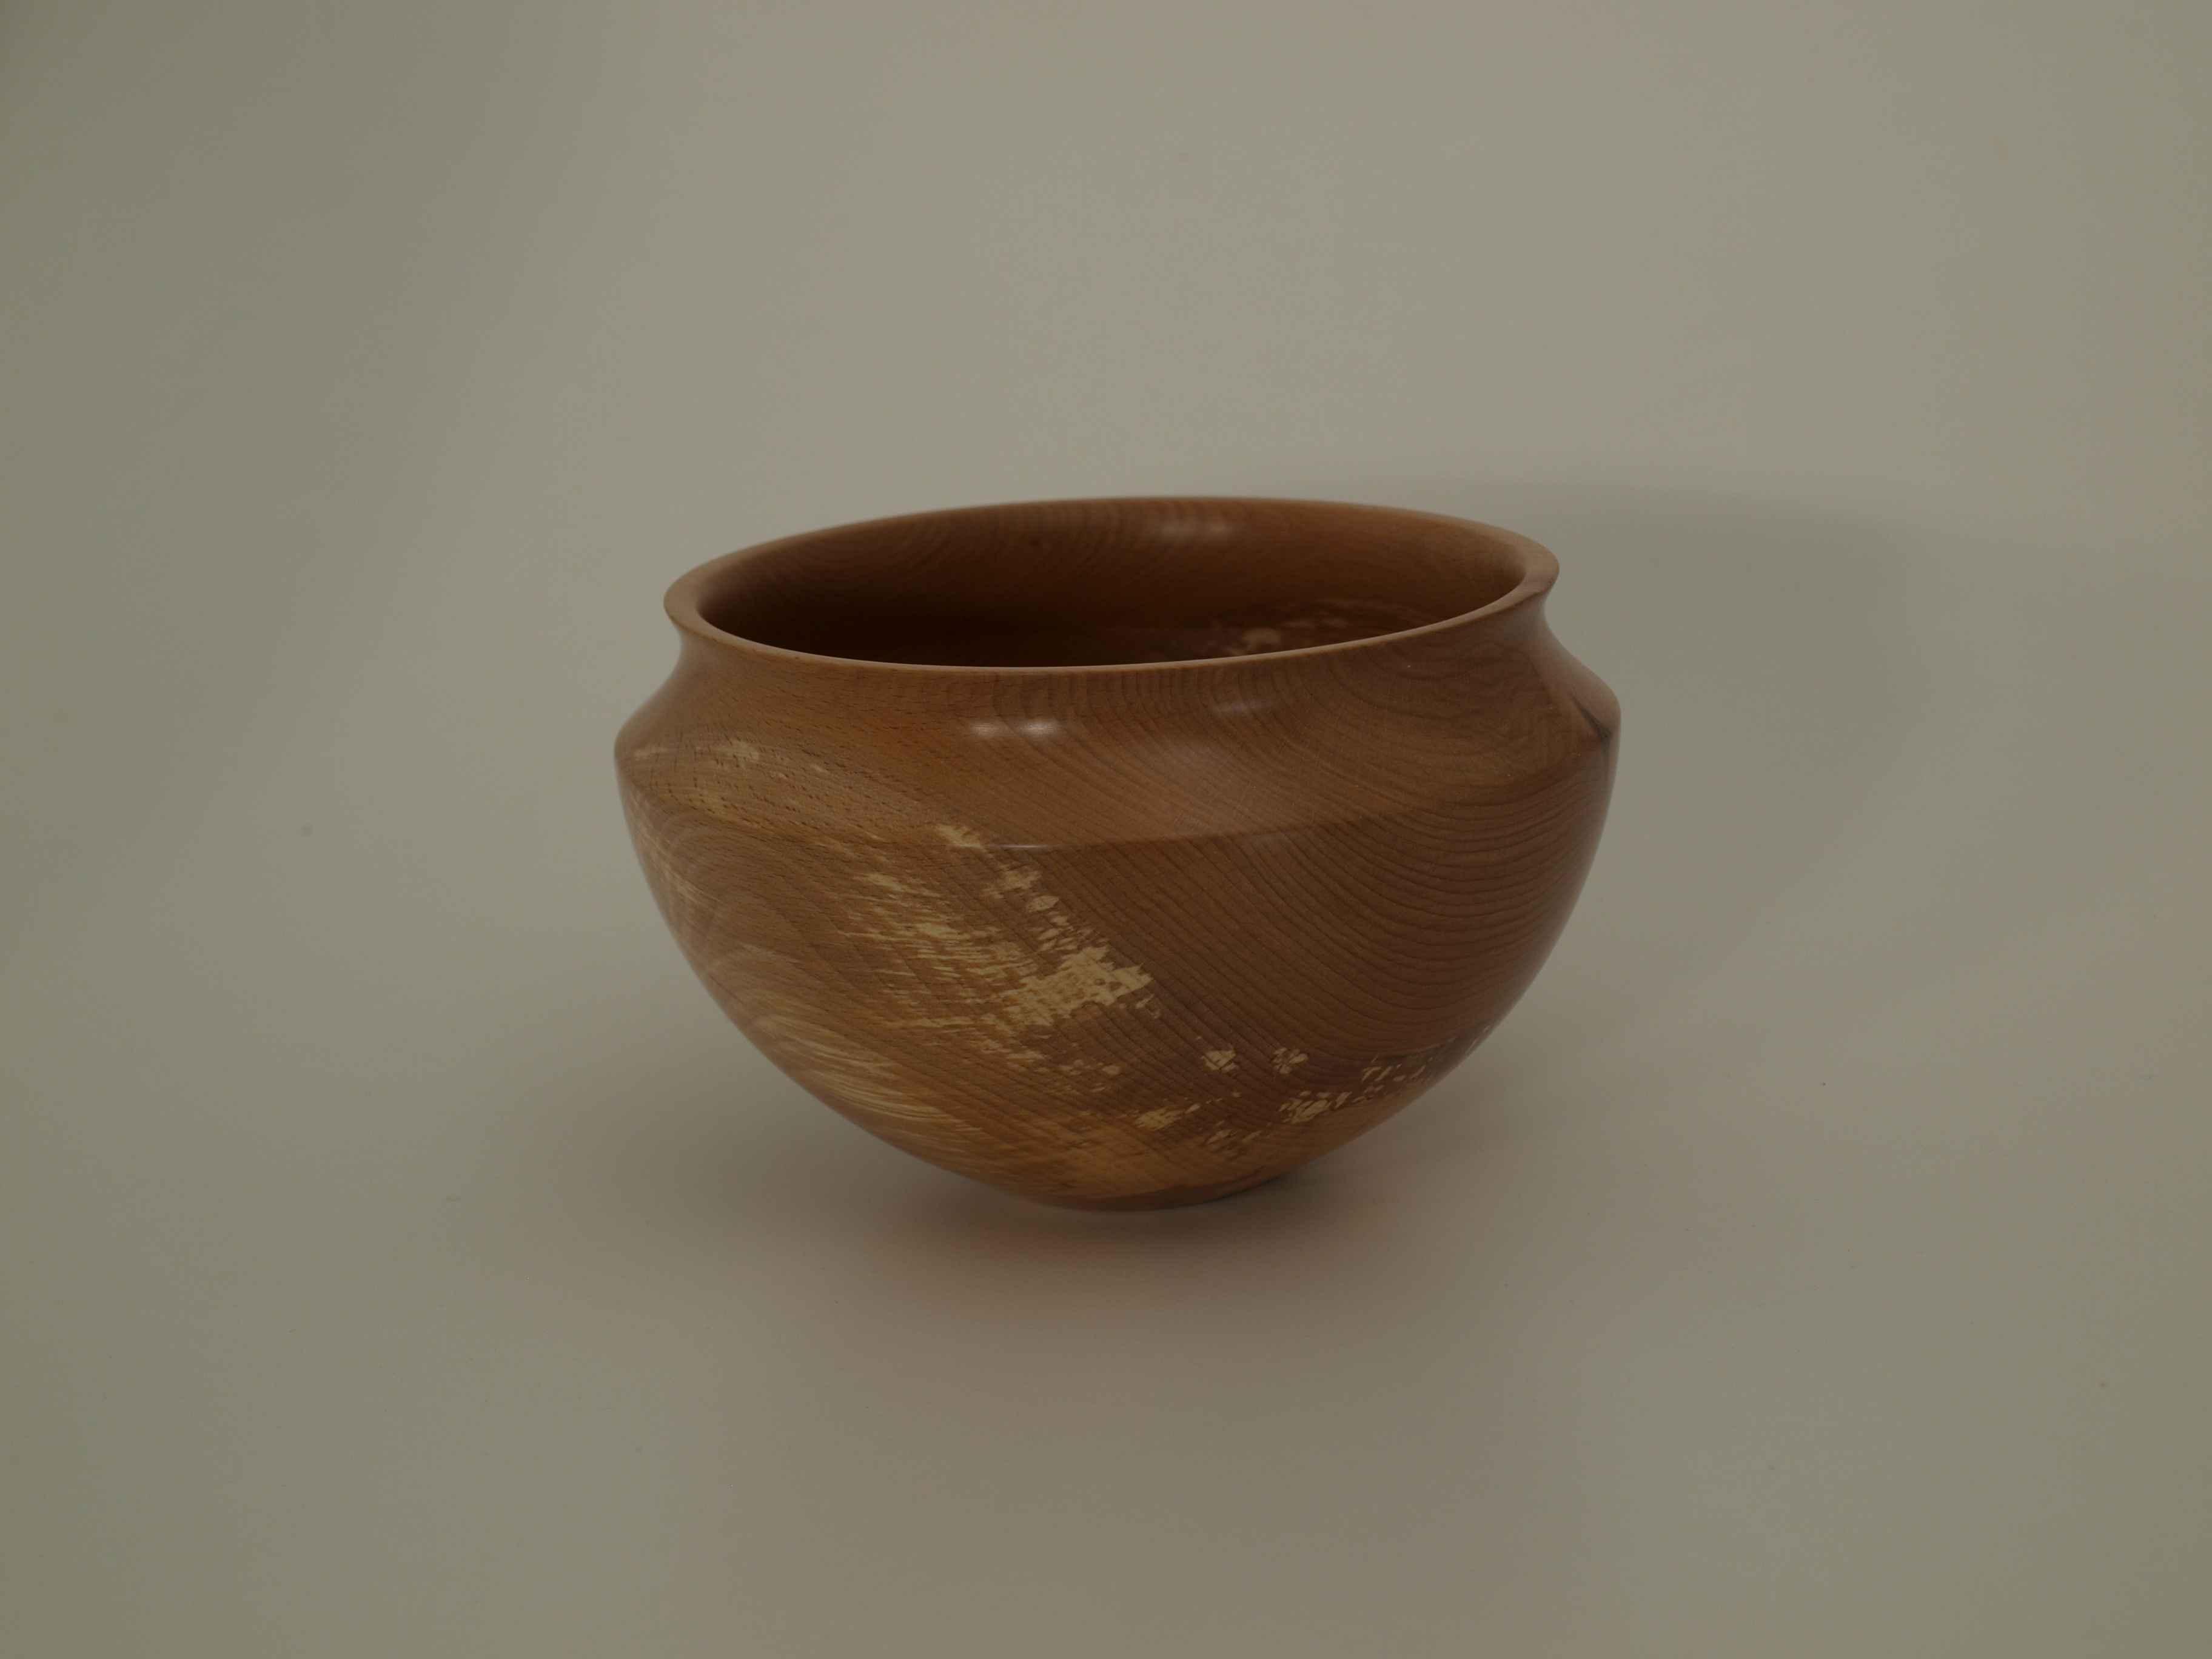 Small Beech Bowl